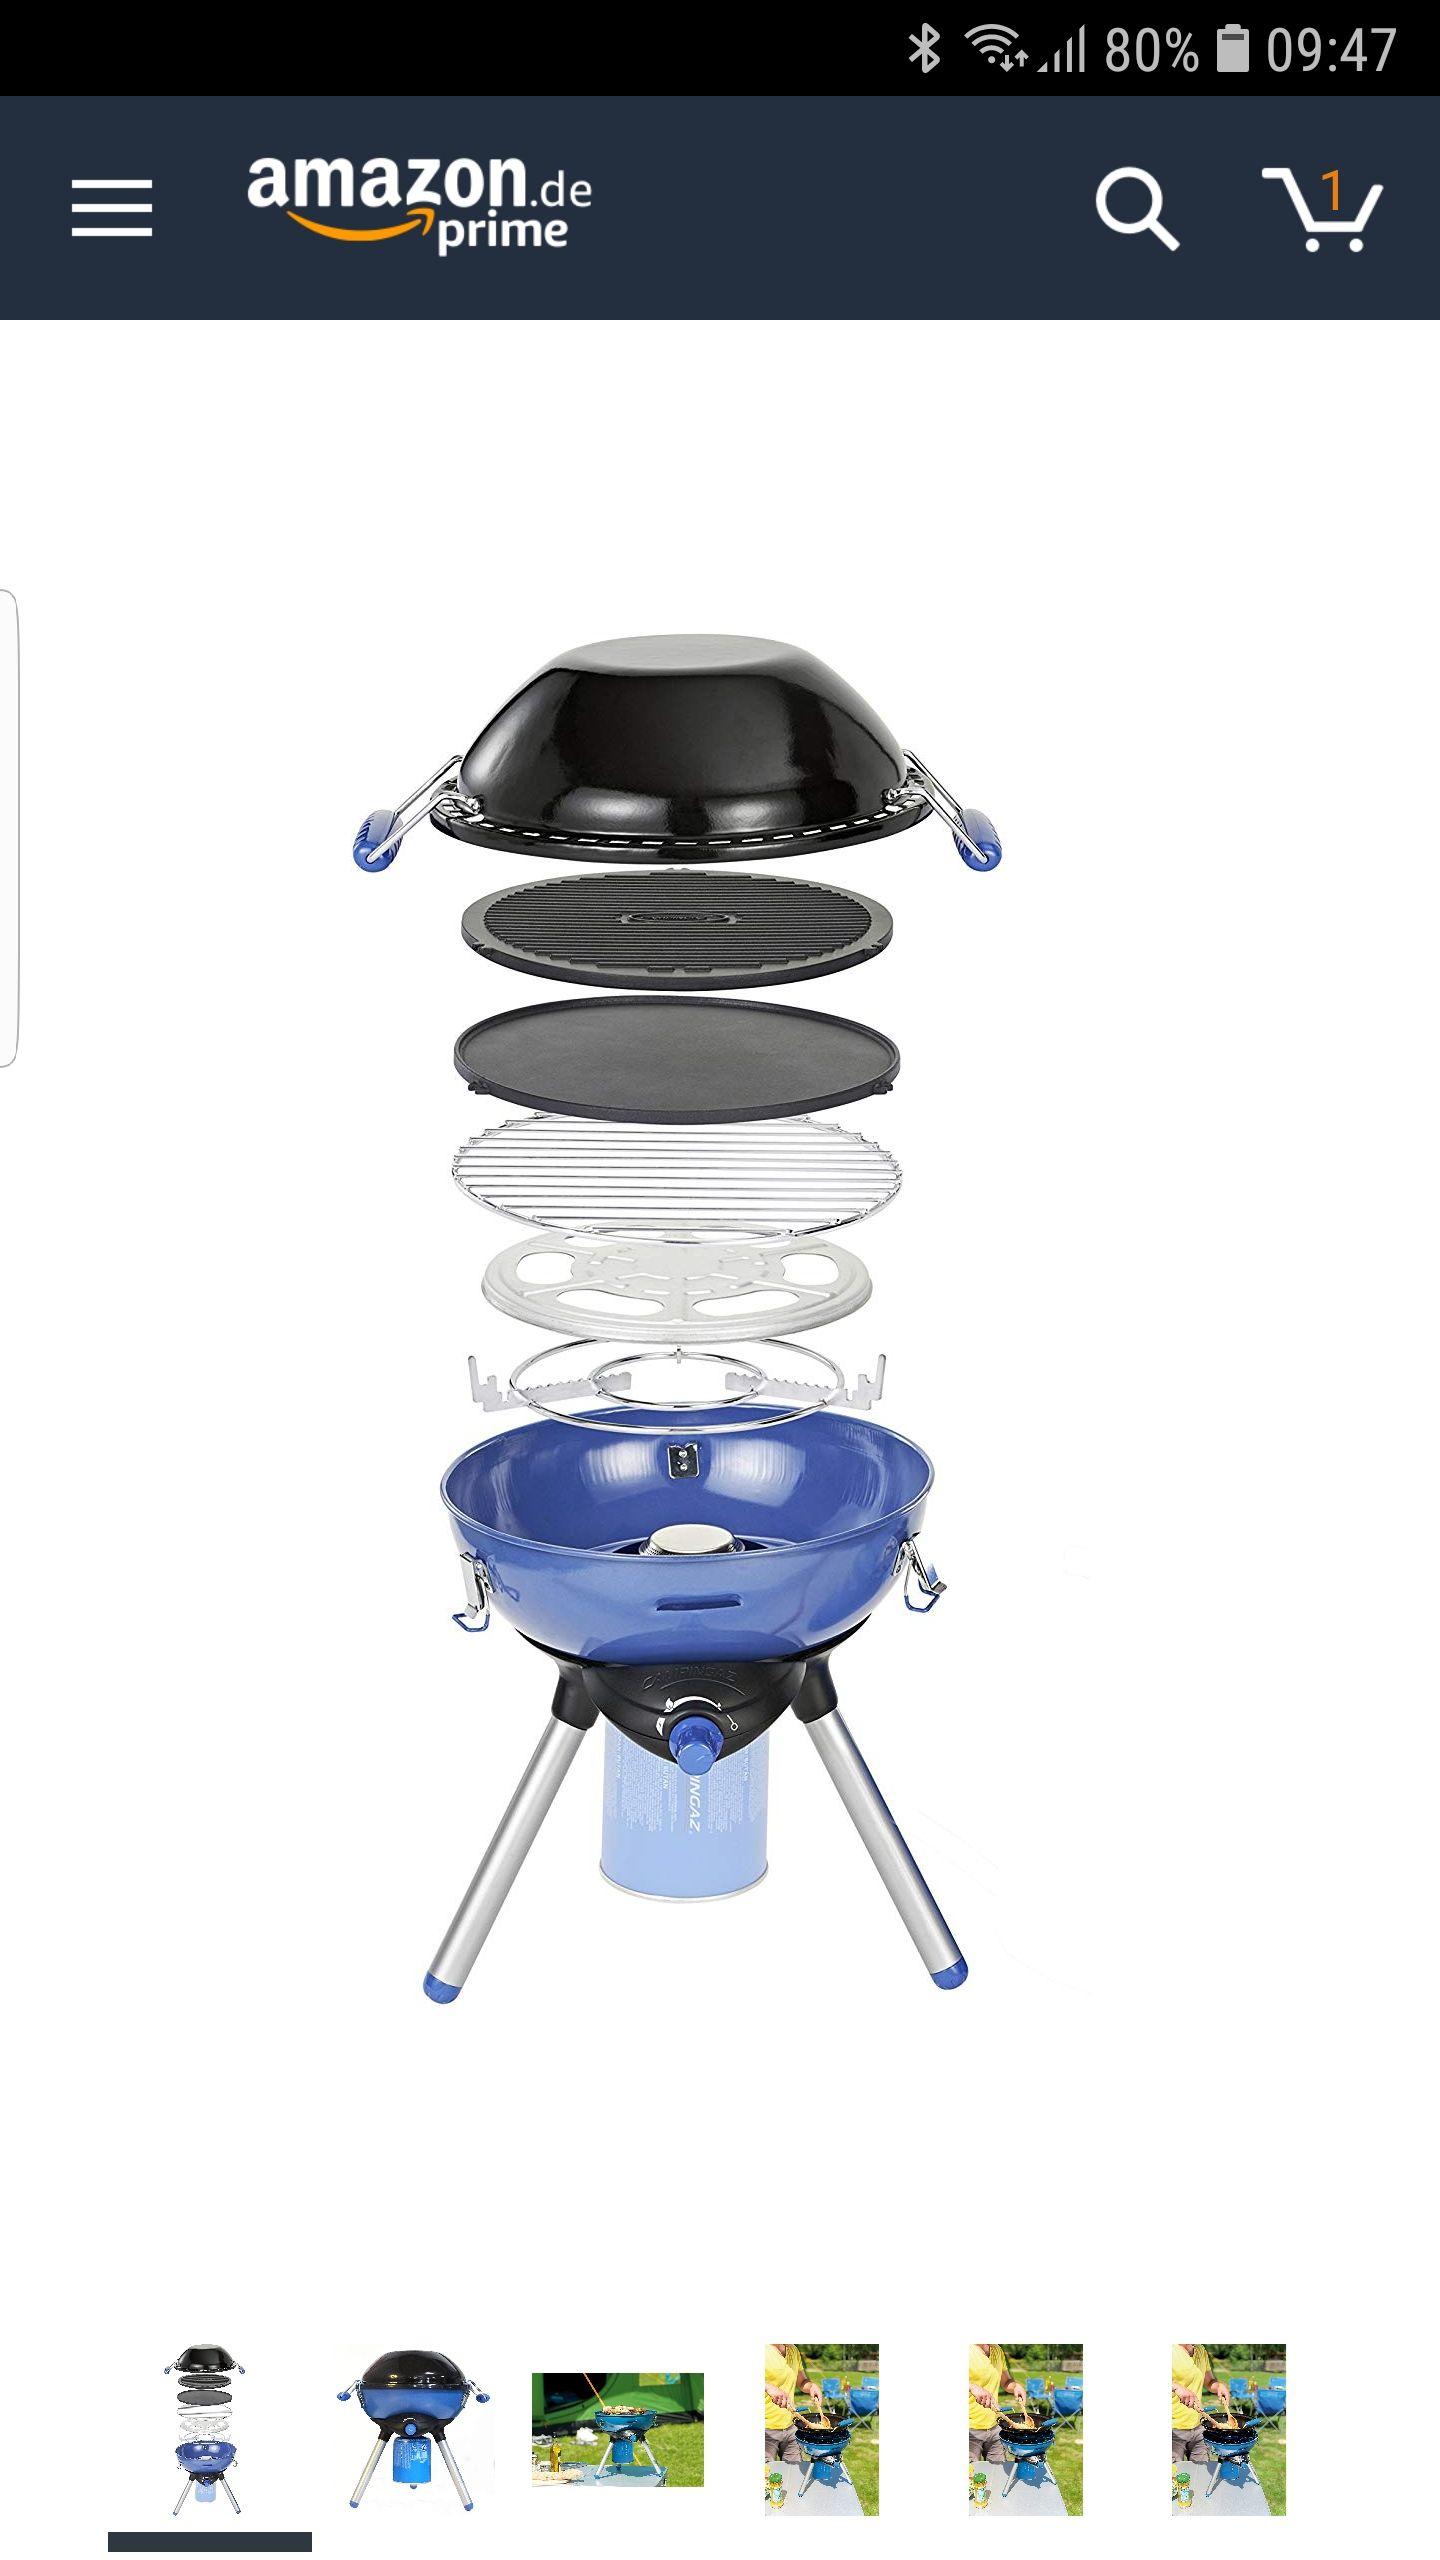 (Primeday) Campingaz Party Grill 400 CV  - kompakter Gasgrill